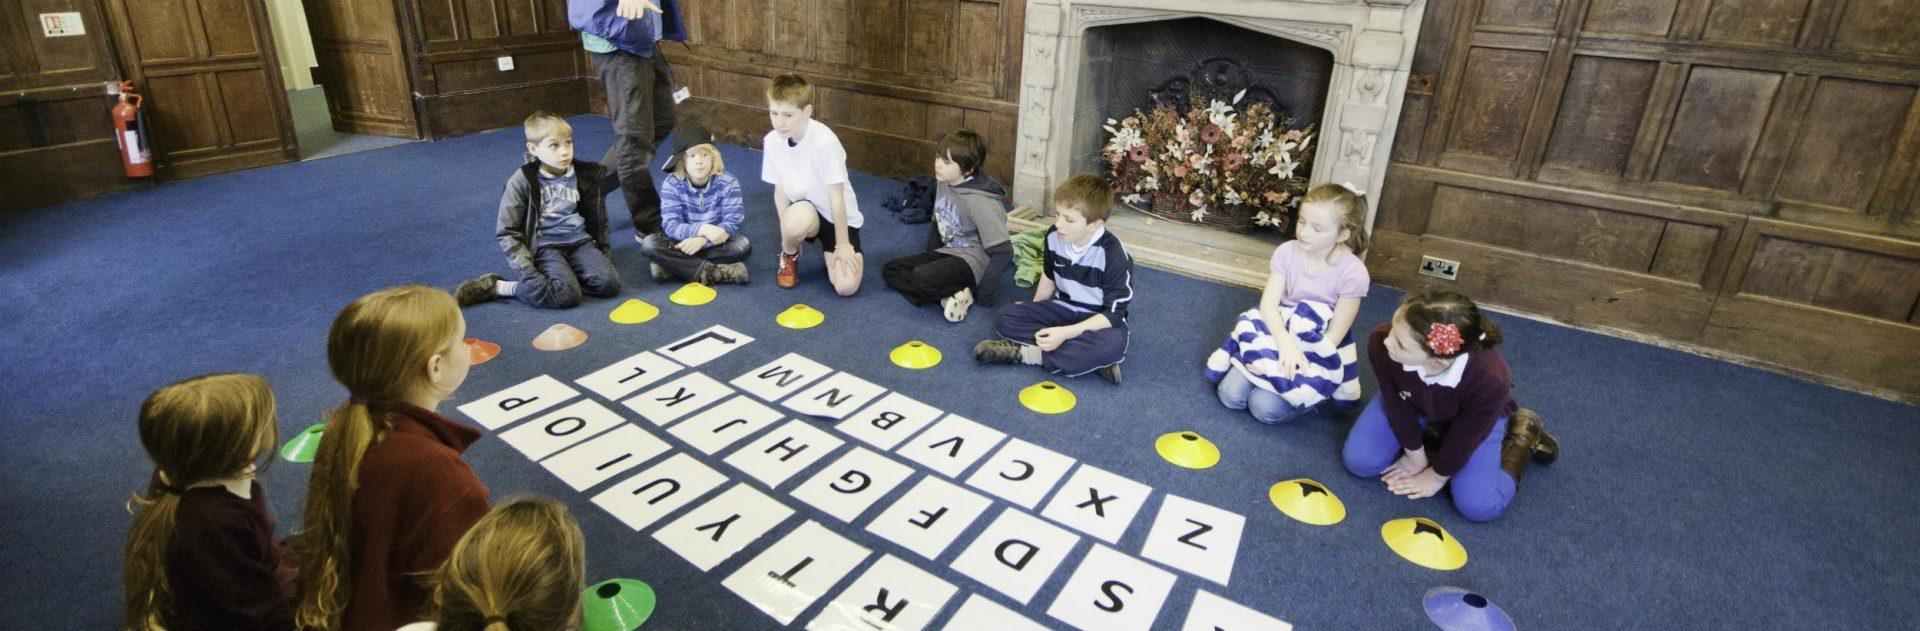 Initiative exercises with children